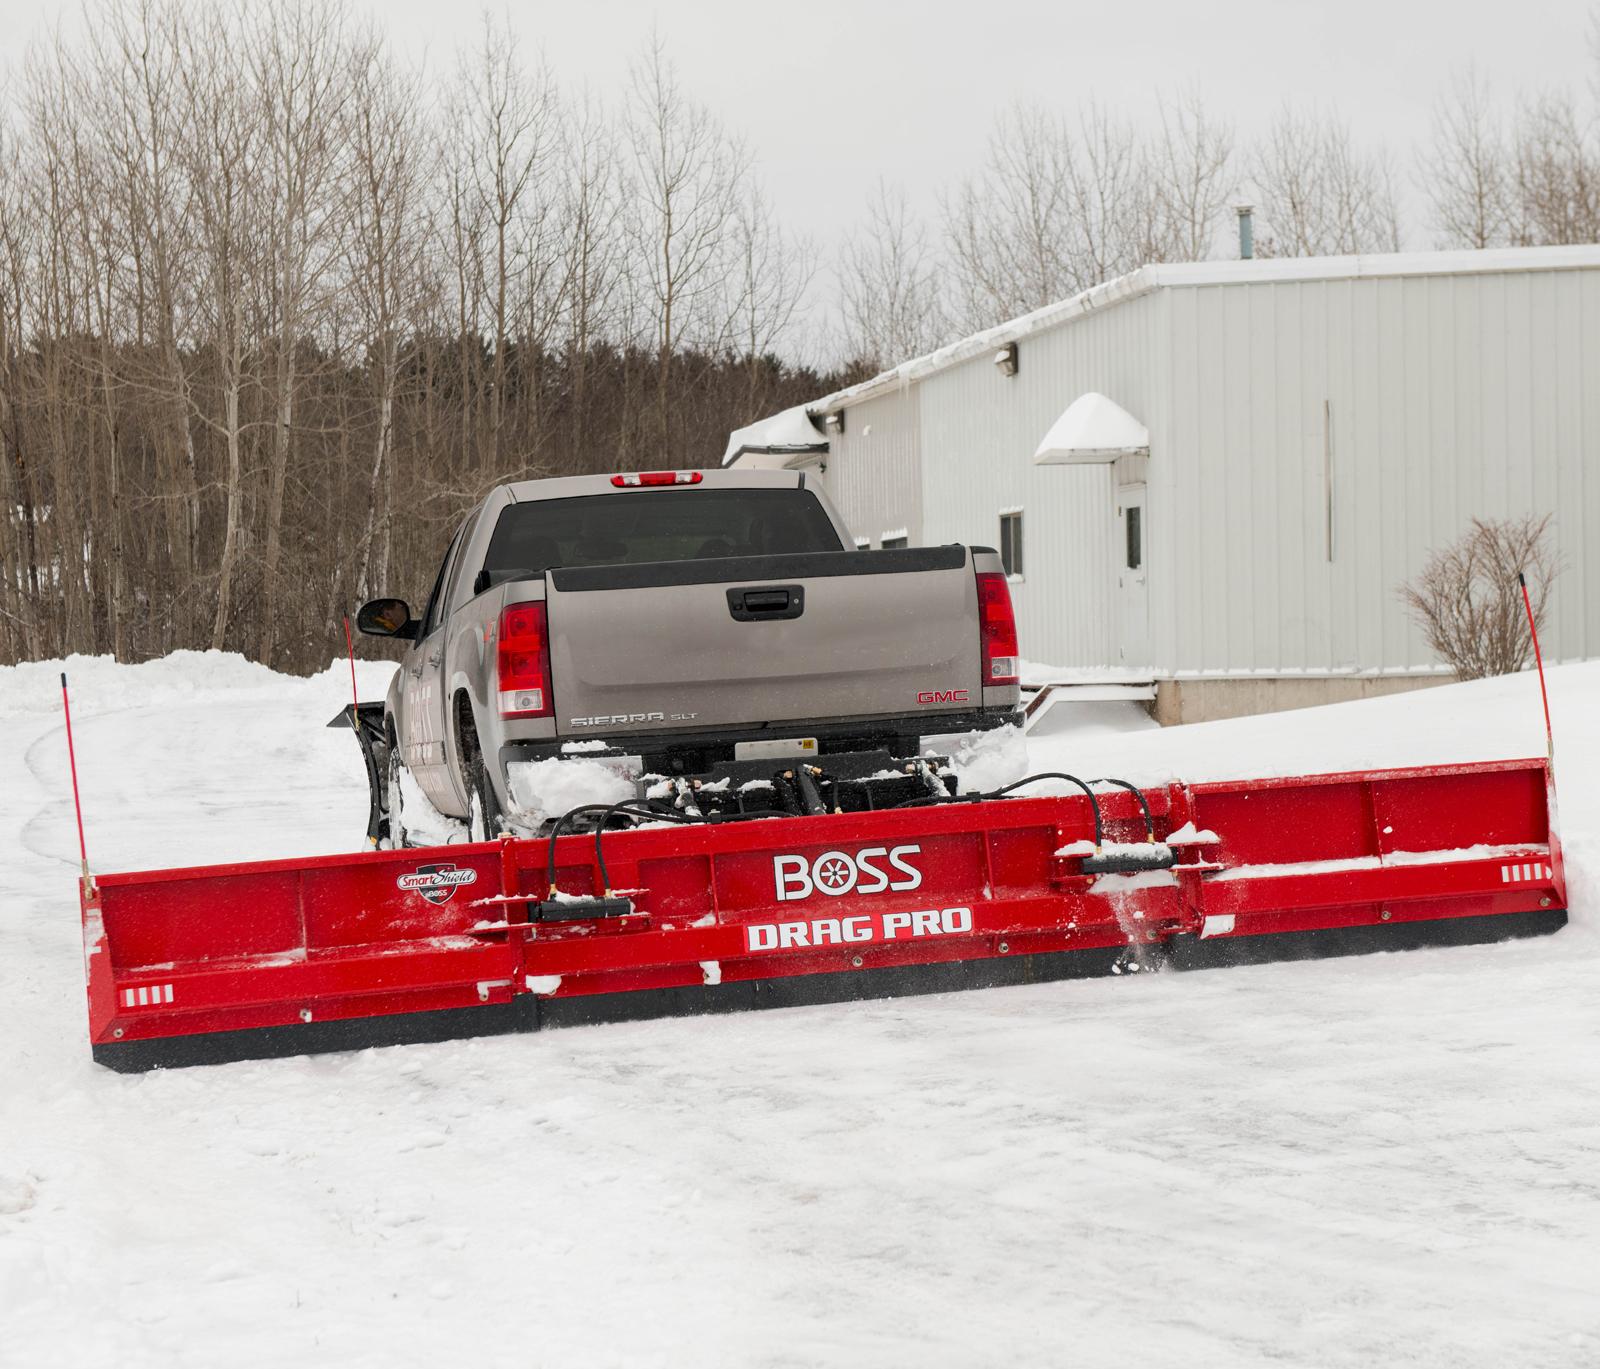 boss snowplow drag pro™Plow Wiring Diagram Used Boss Snow Plow Mounts Chevrolet Silverado #3